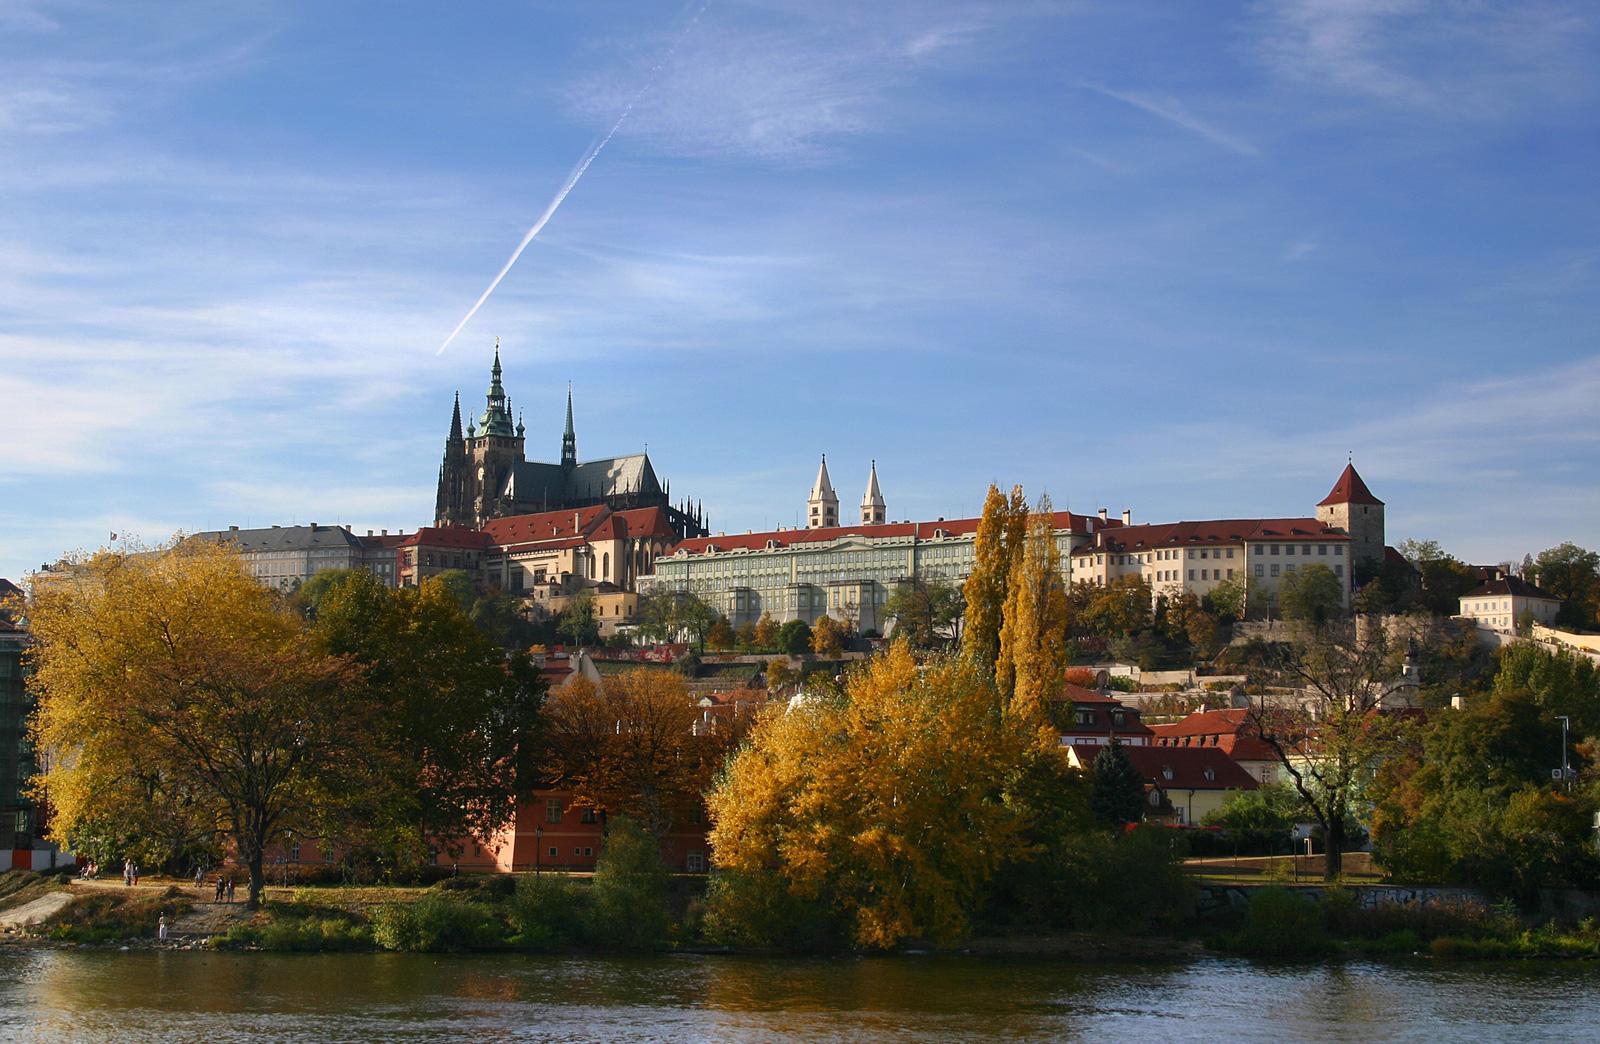 Cetatea, palatul si catedrala st. Vitus din Praga